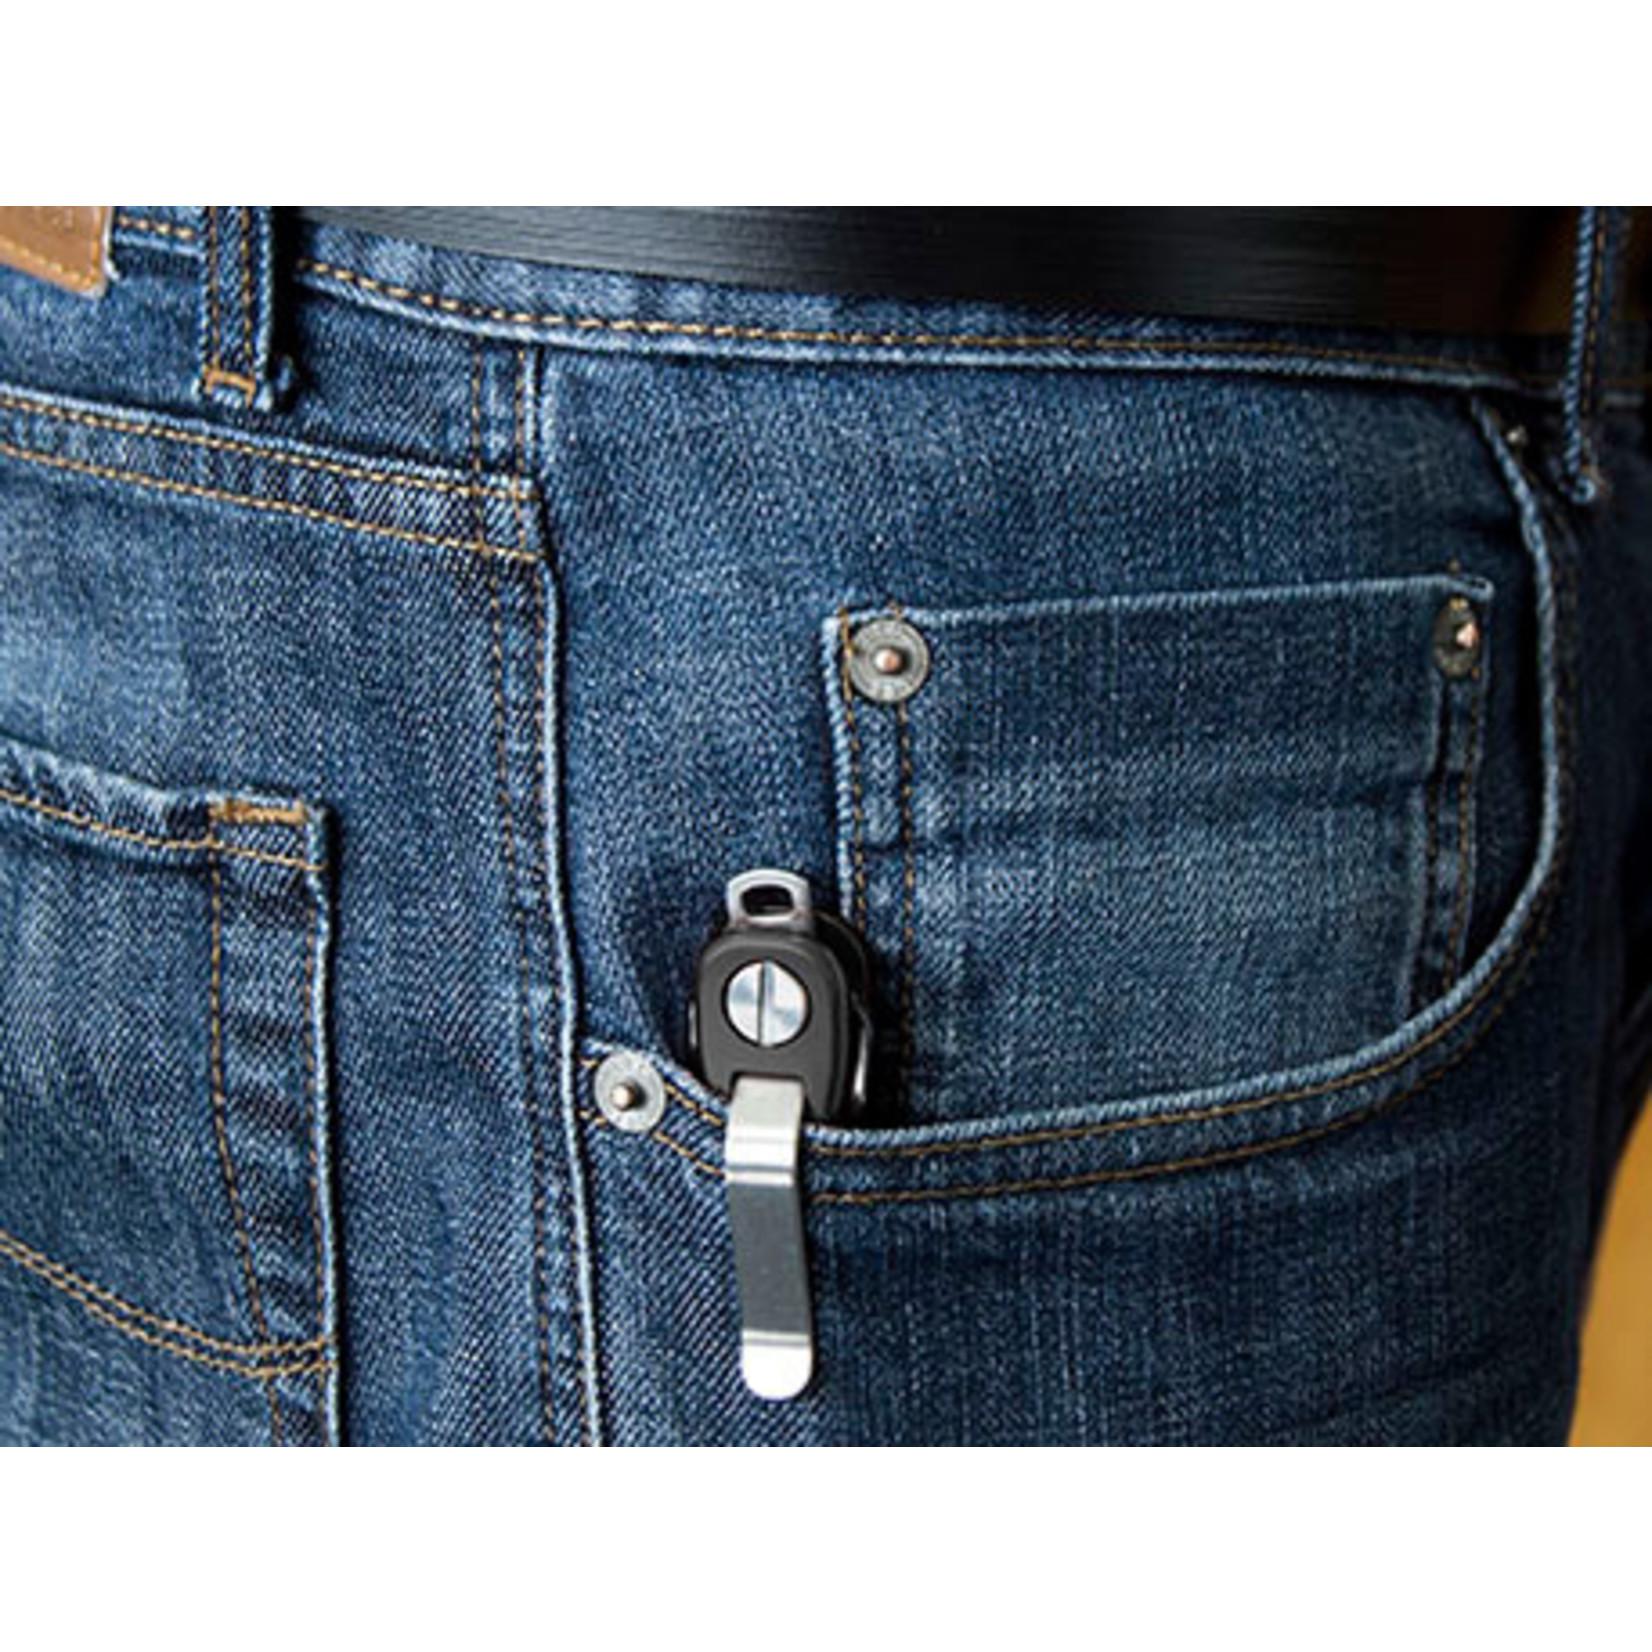 KeySmart KeySmart Rugged sleutelhouder zwart